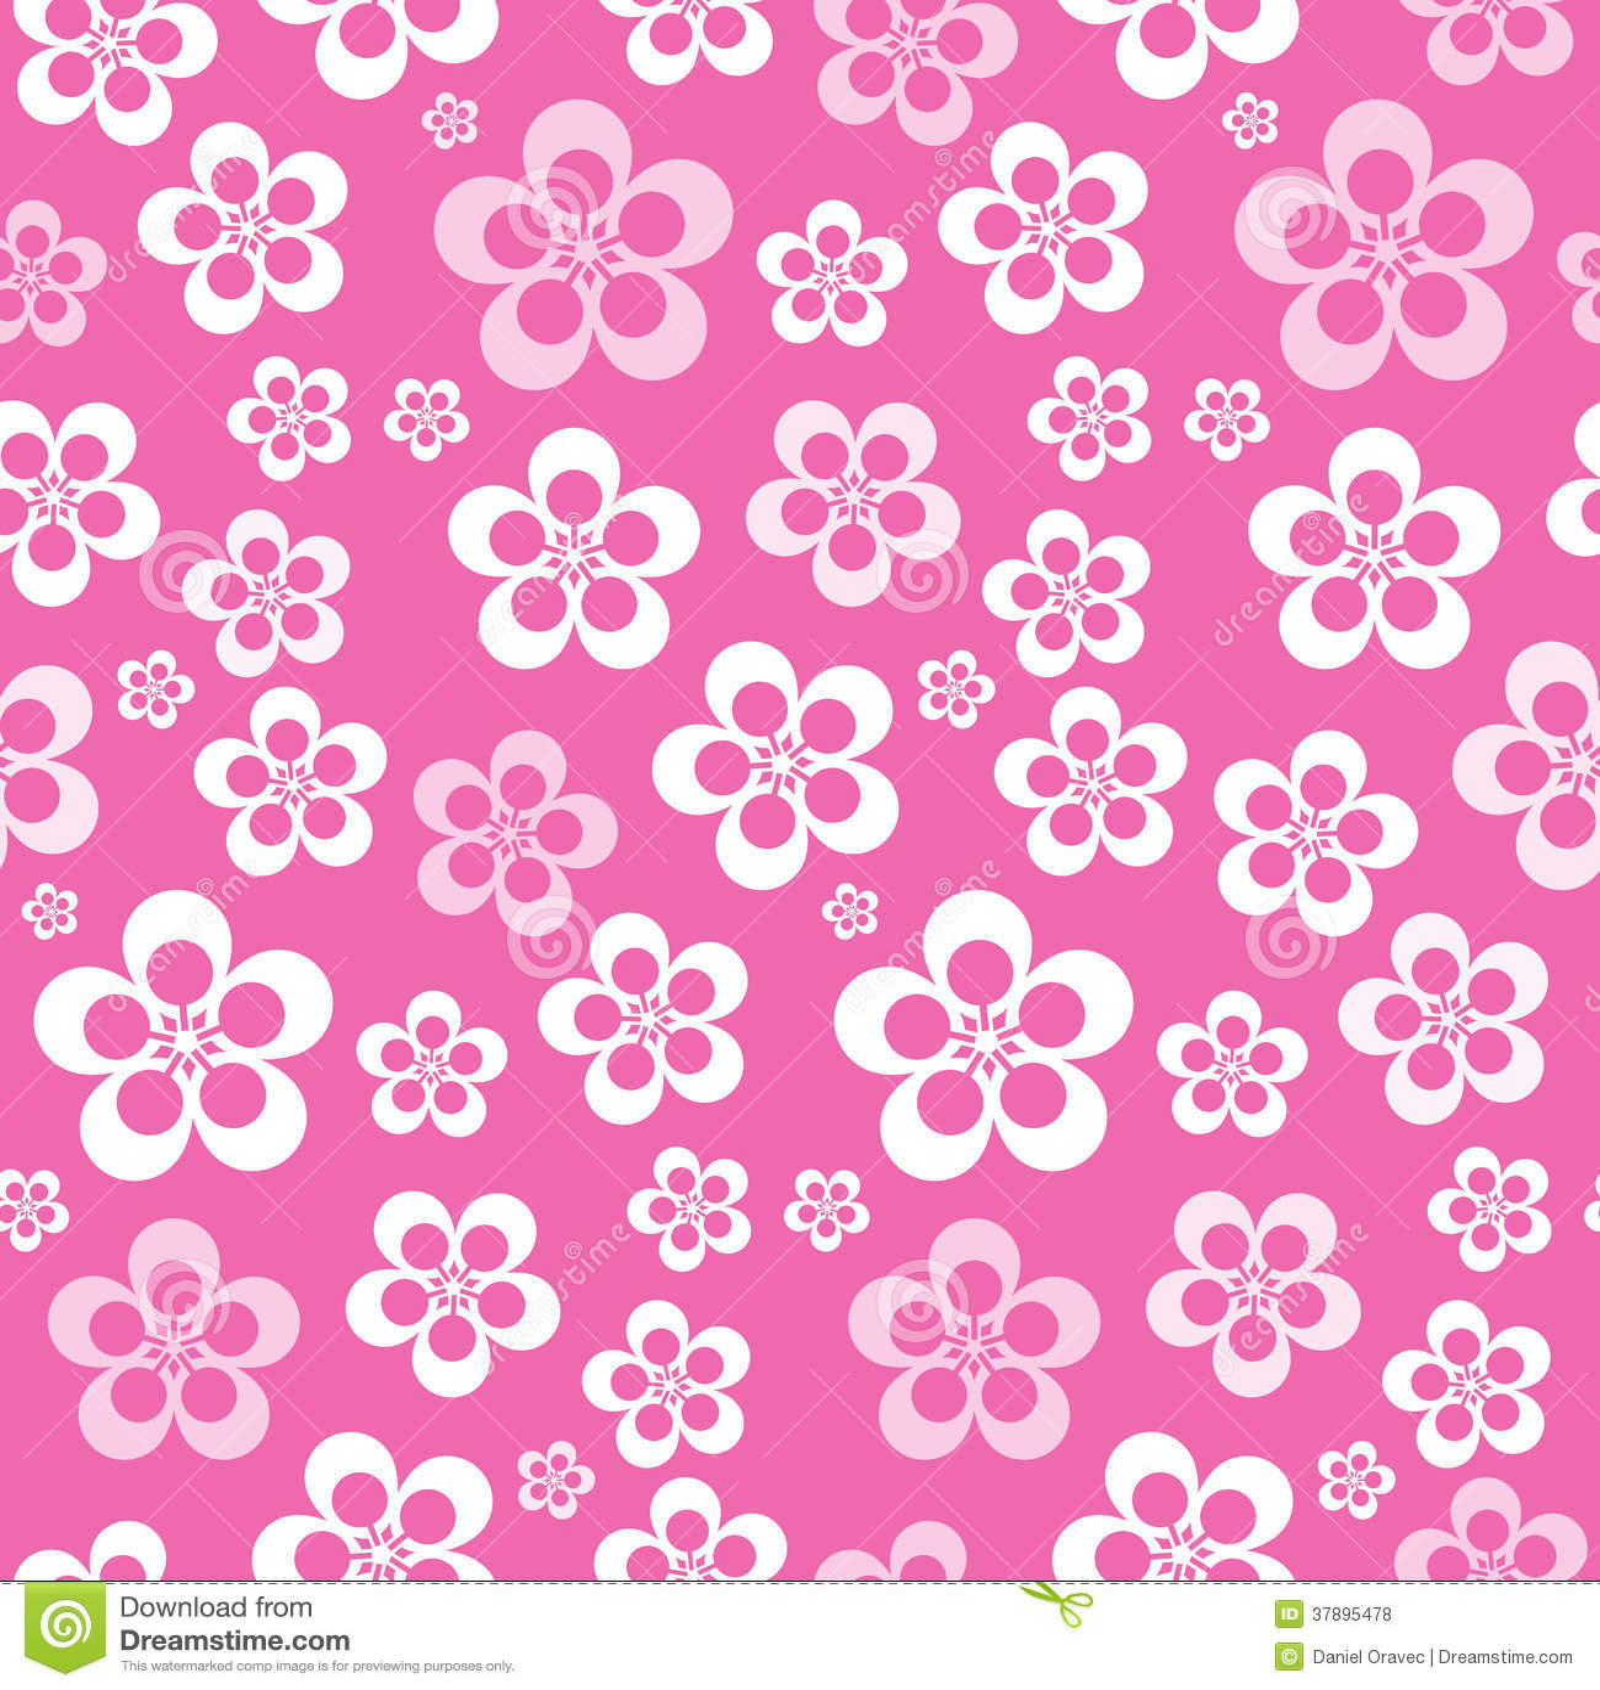 Vector Abstract Retro Naadloos Roze Bloempatroon